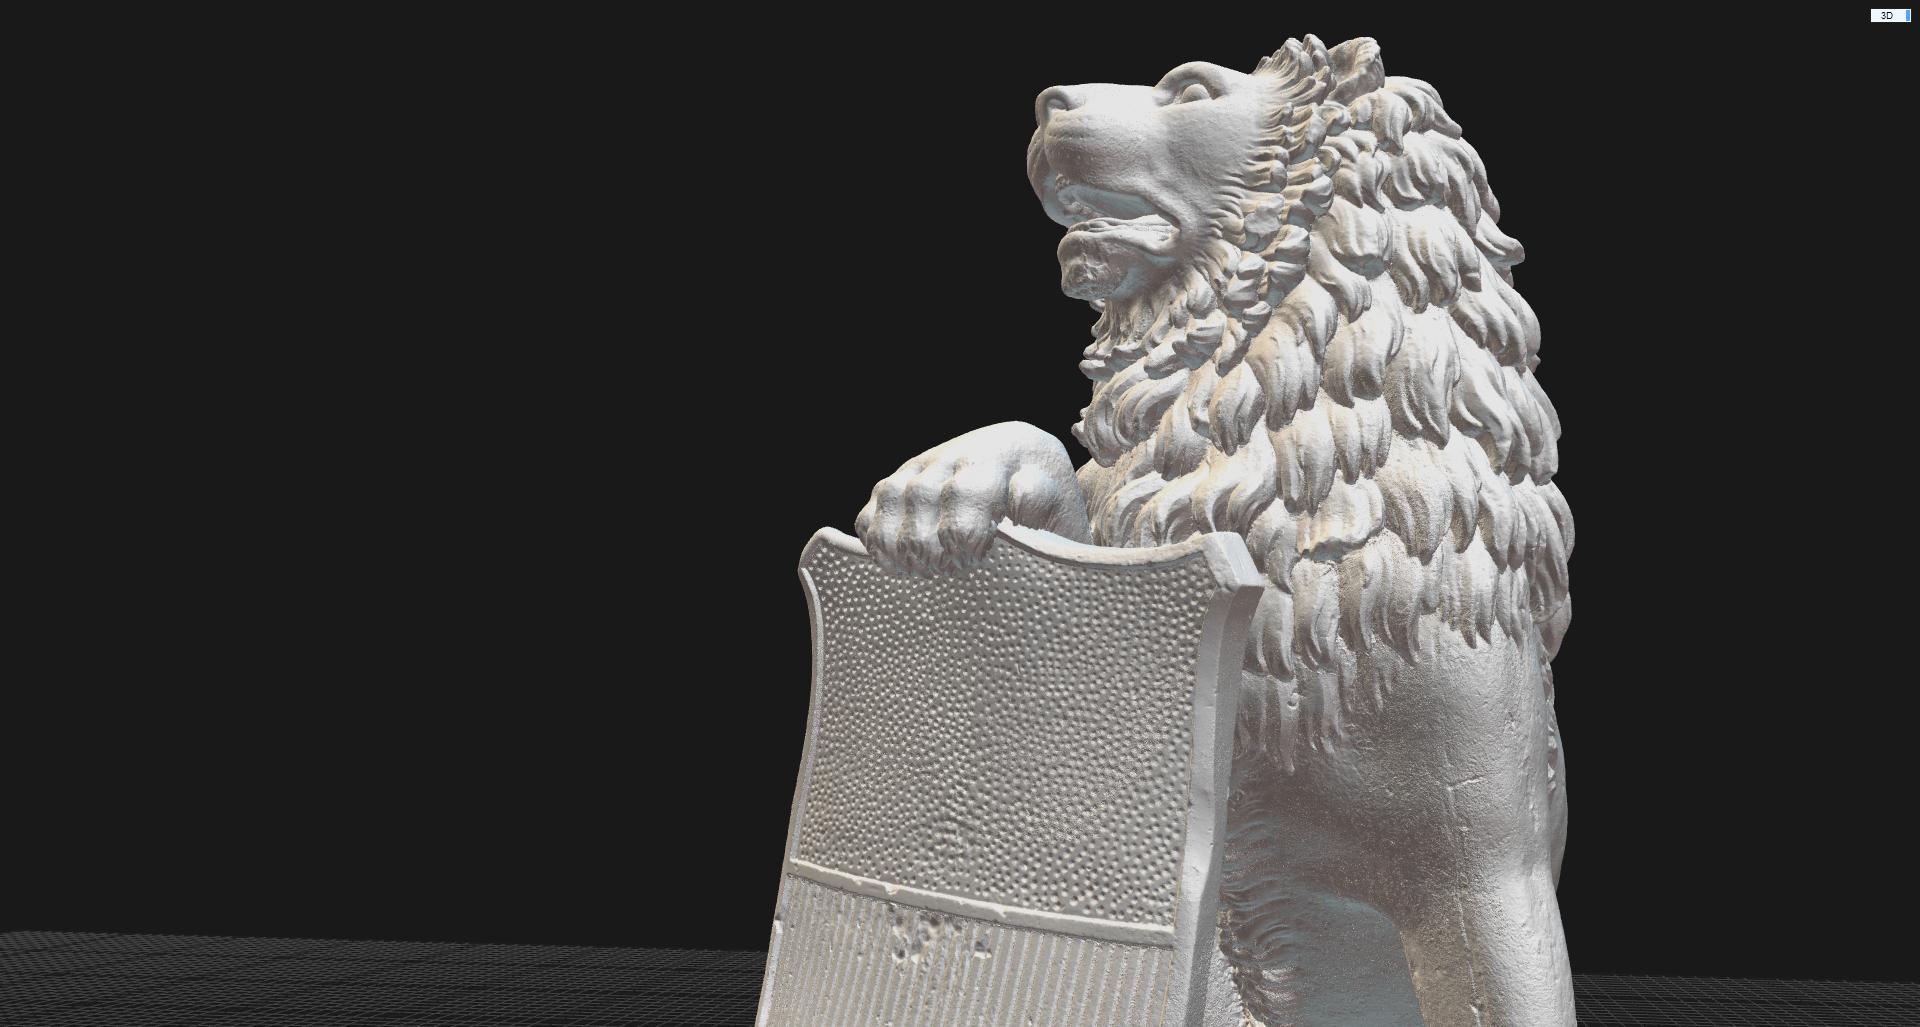 3D Scan by Paul Safko - Screenshot